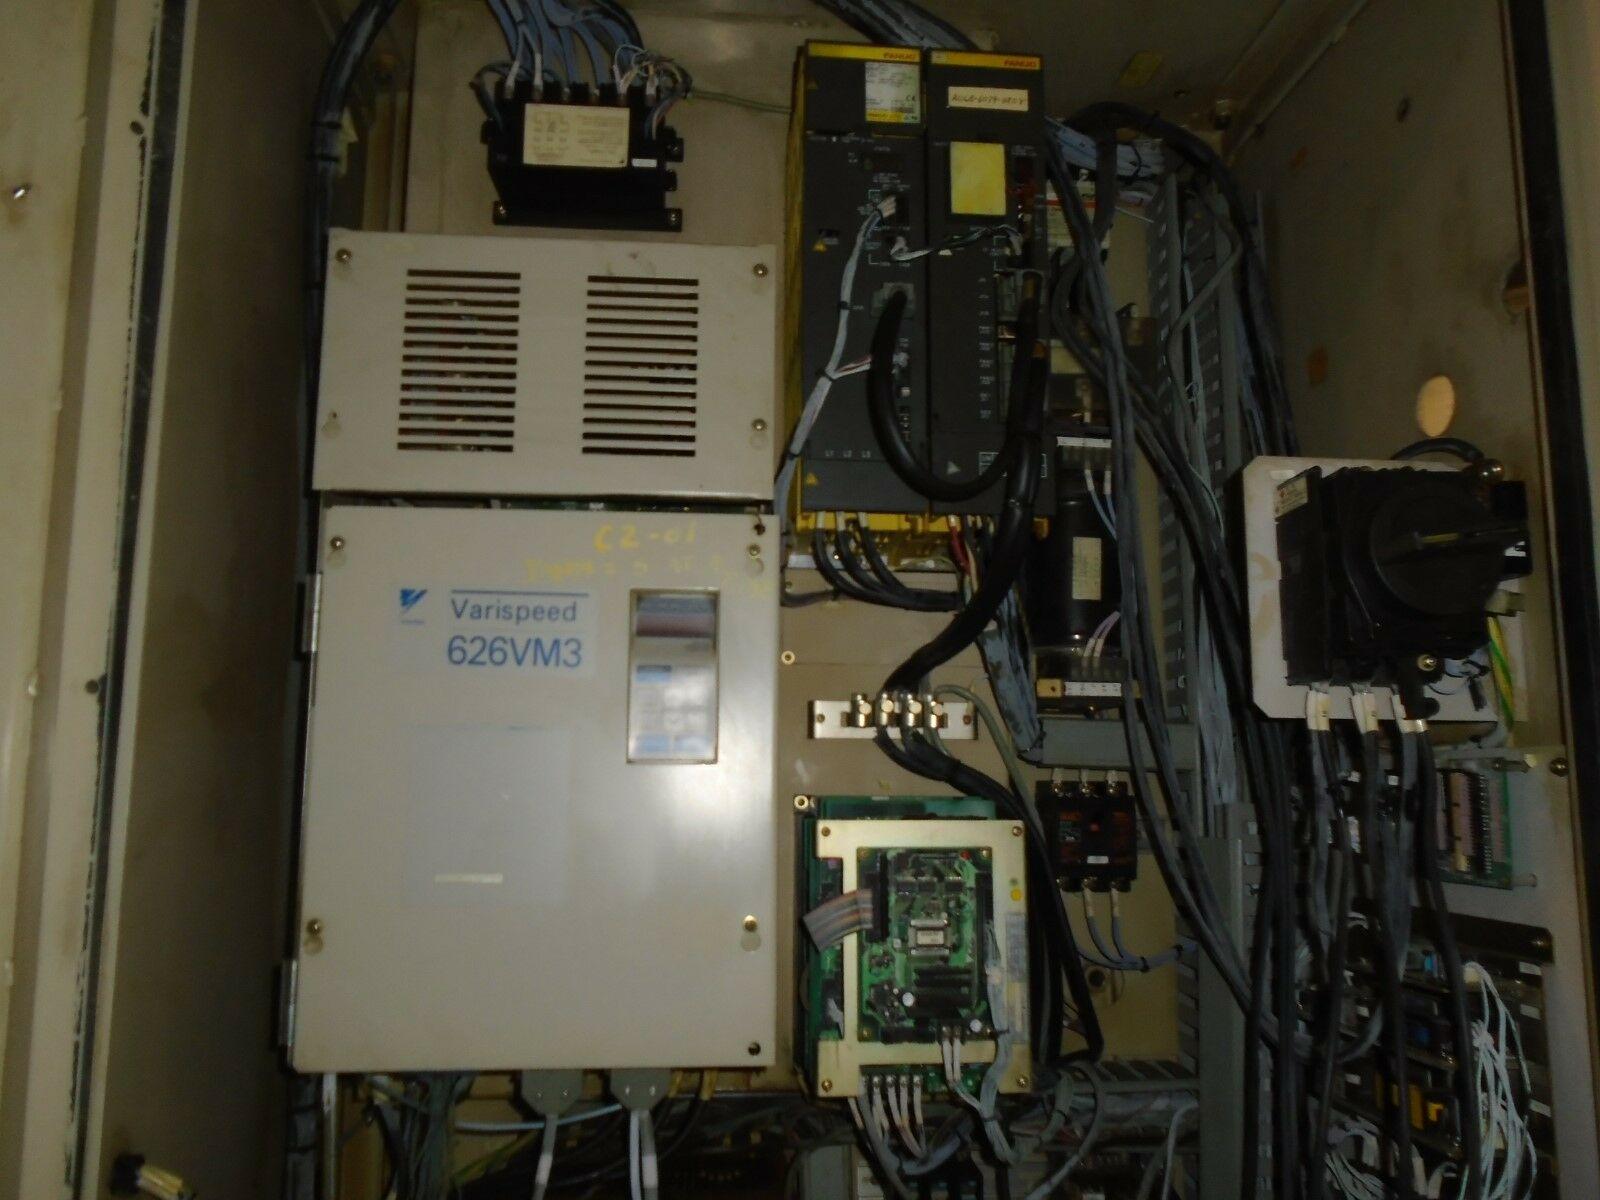 Hitachi Seiki CS20 Vertical CNC Lathe 10L Seicos Control 1998 - Image 11 of 12